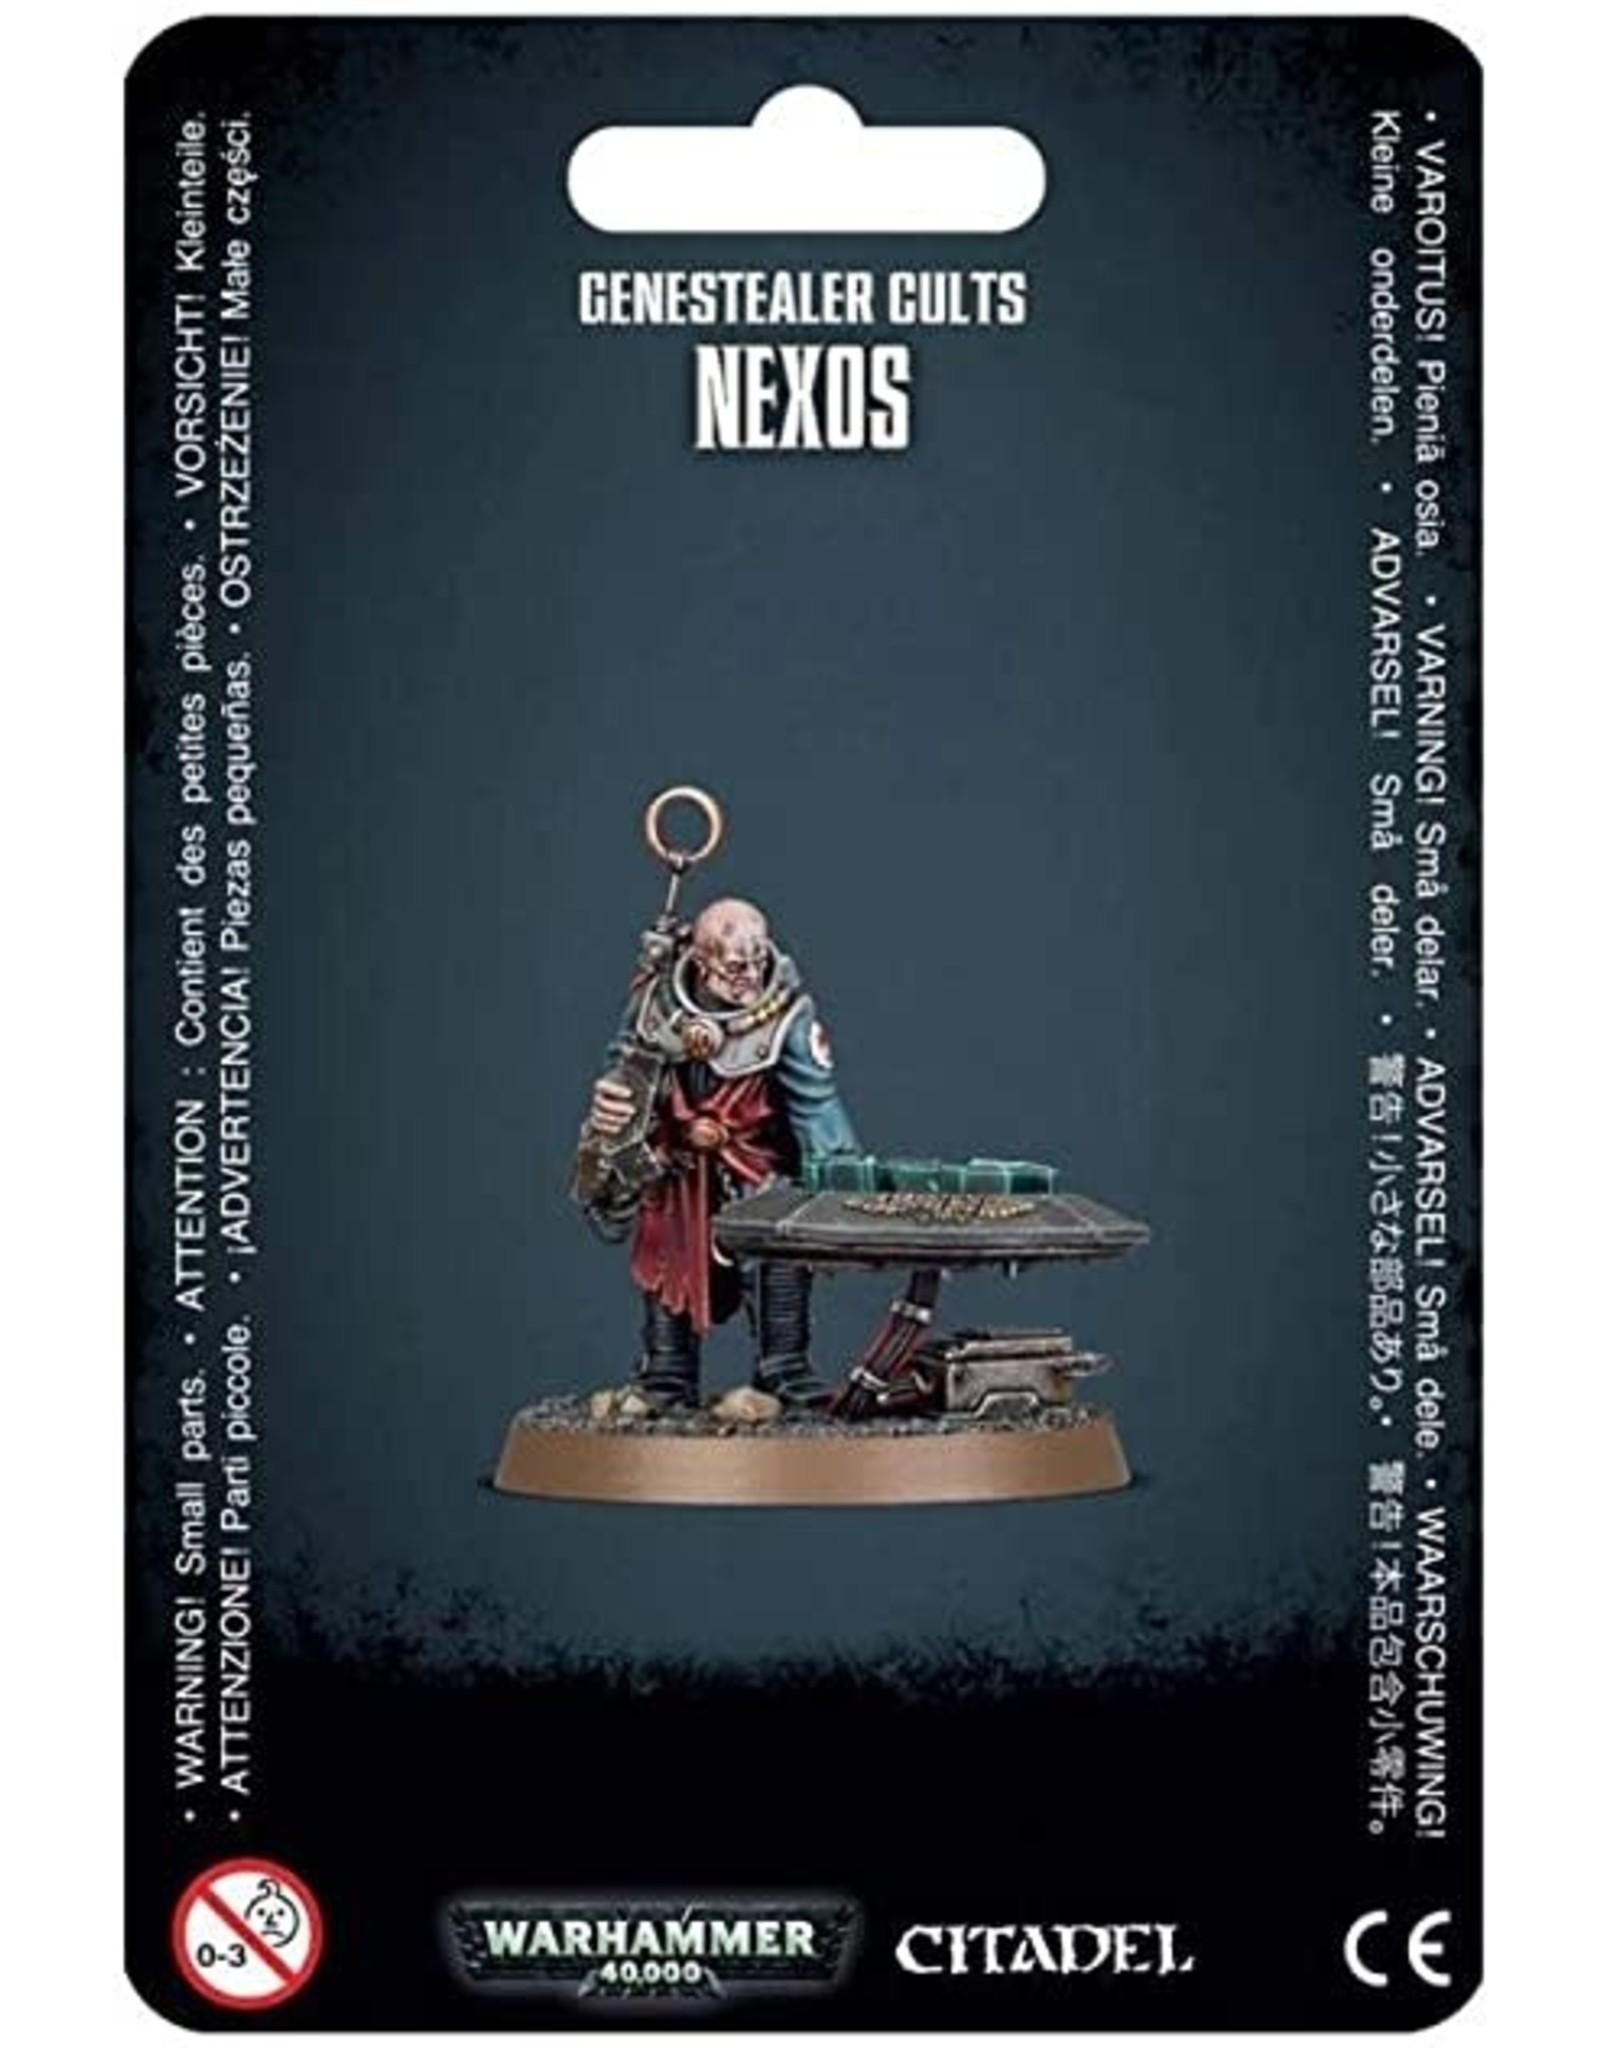 Genestealer Cults Nexos (40K)